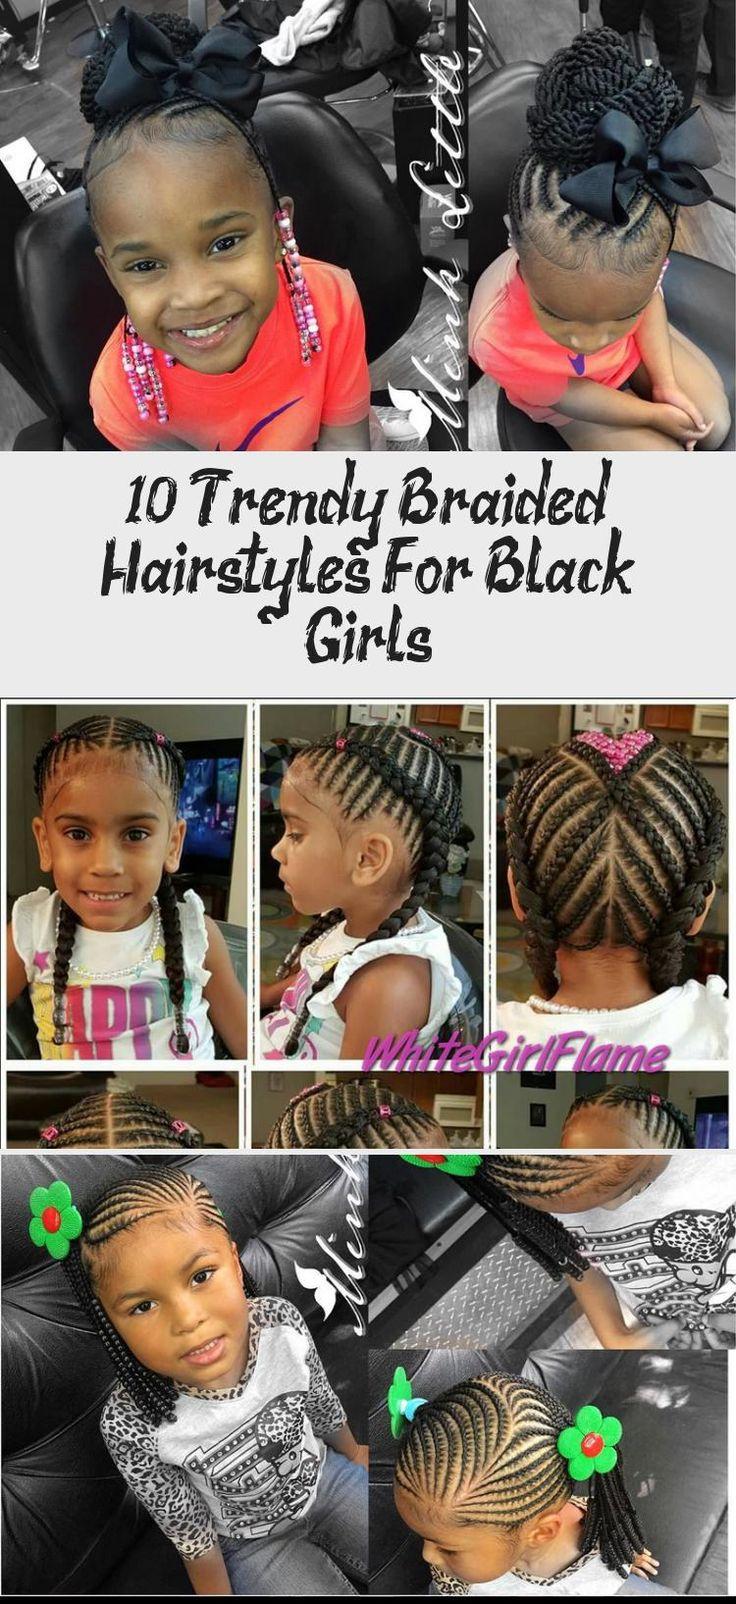 10 Trendy Braided Hairstyles for Black Girls » Black Kids Hairstyles #babyhairstylesShortHair #babyhairstylesEdges #babyhairstylesVideos #babyhairstylesSketch #babyhairstylesBaptism